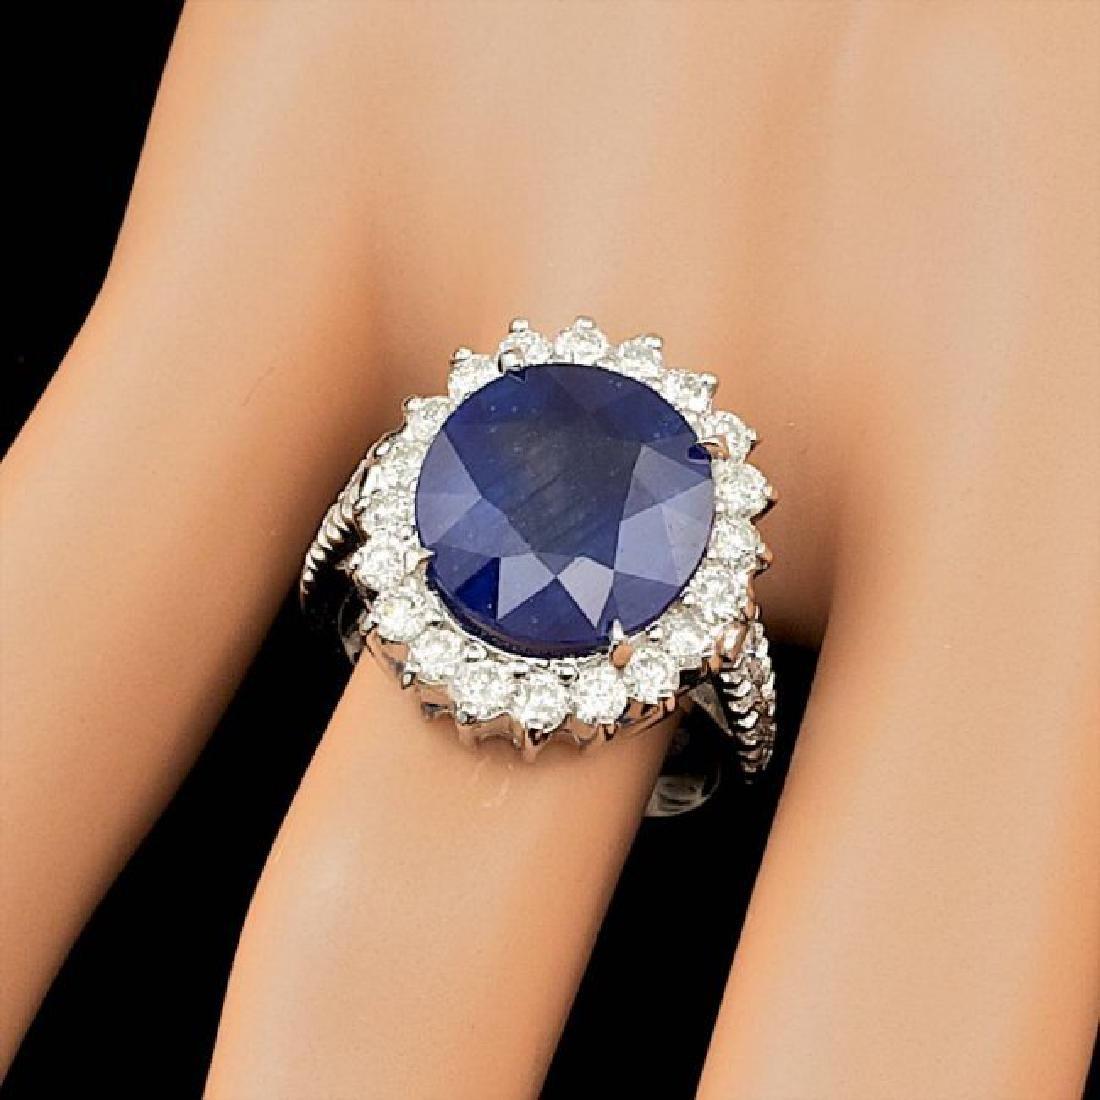 14k Gold 9.50ct Sapphire 1.35ct Diamond Ring - 3